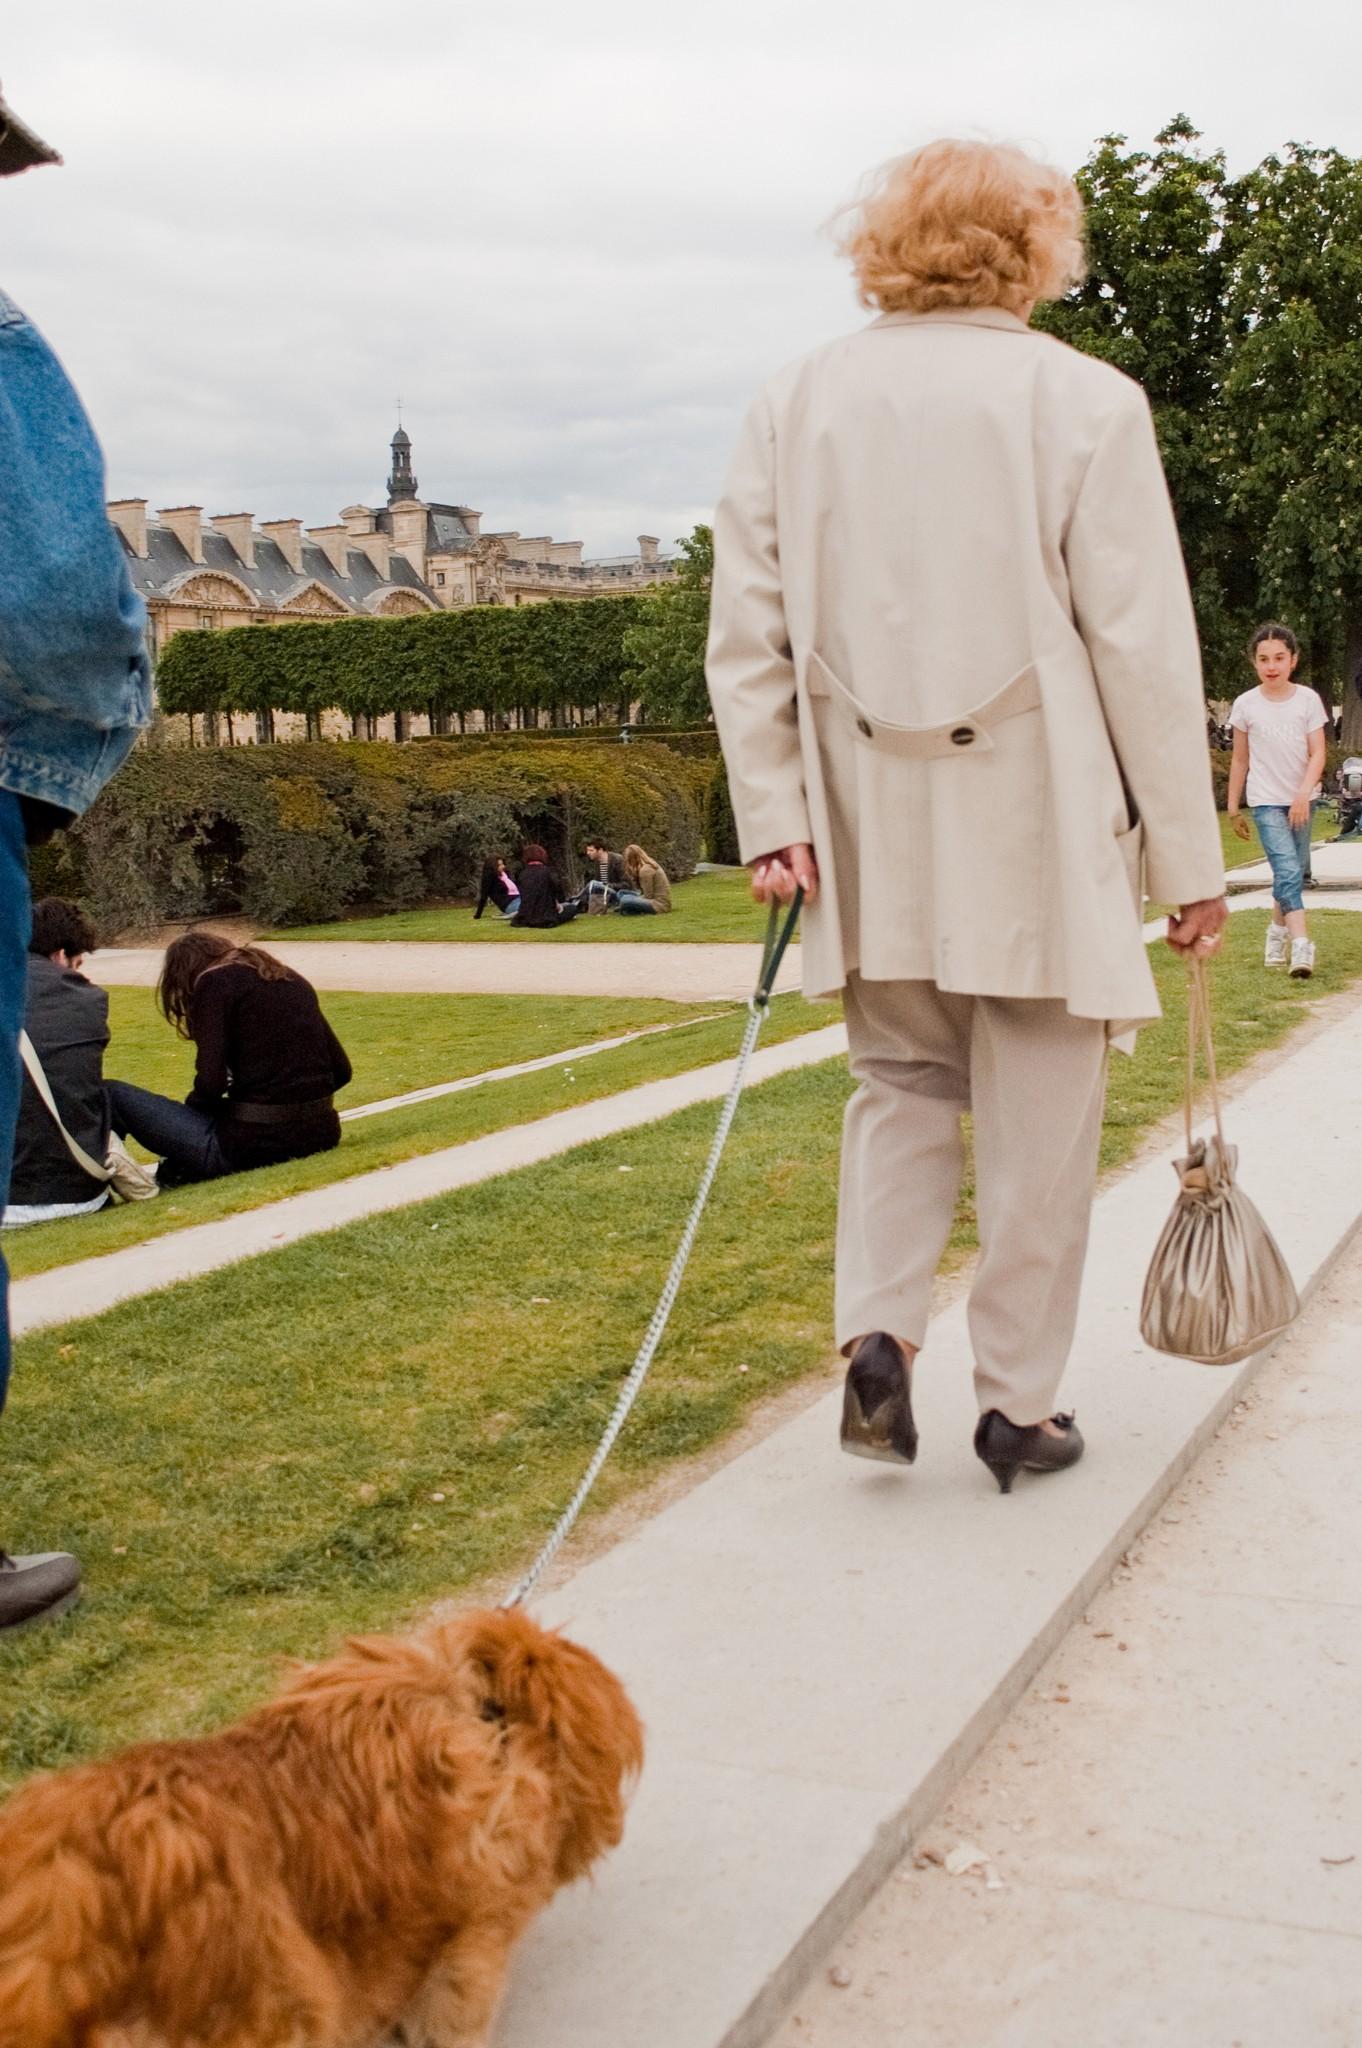 Jardin des Tuileries, Paris, Mai 2009